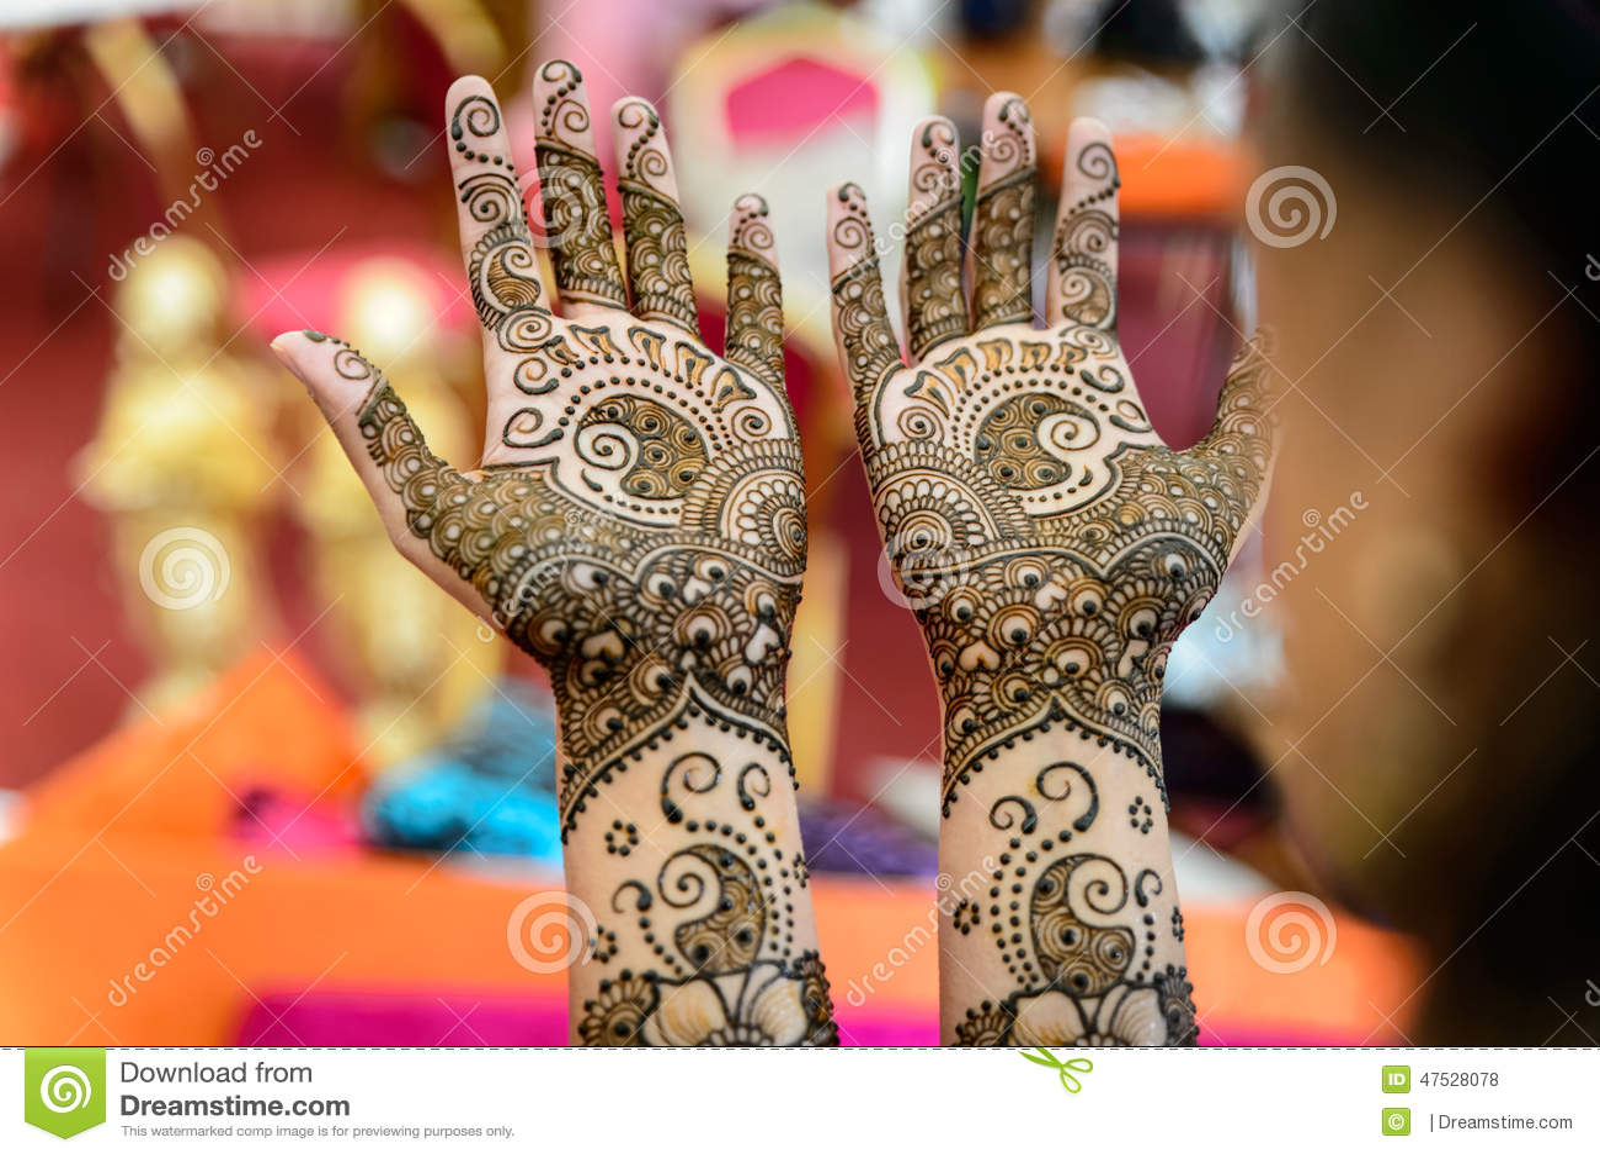 Henna Art On Hands